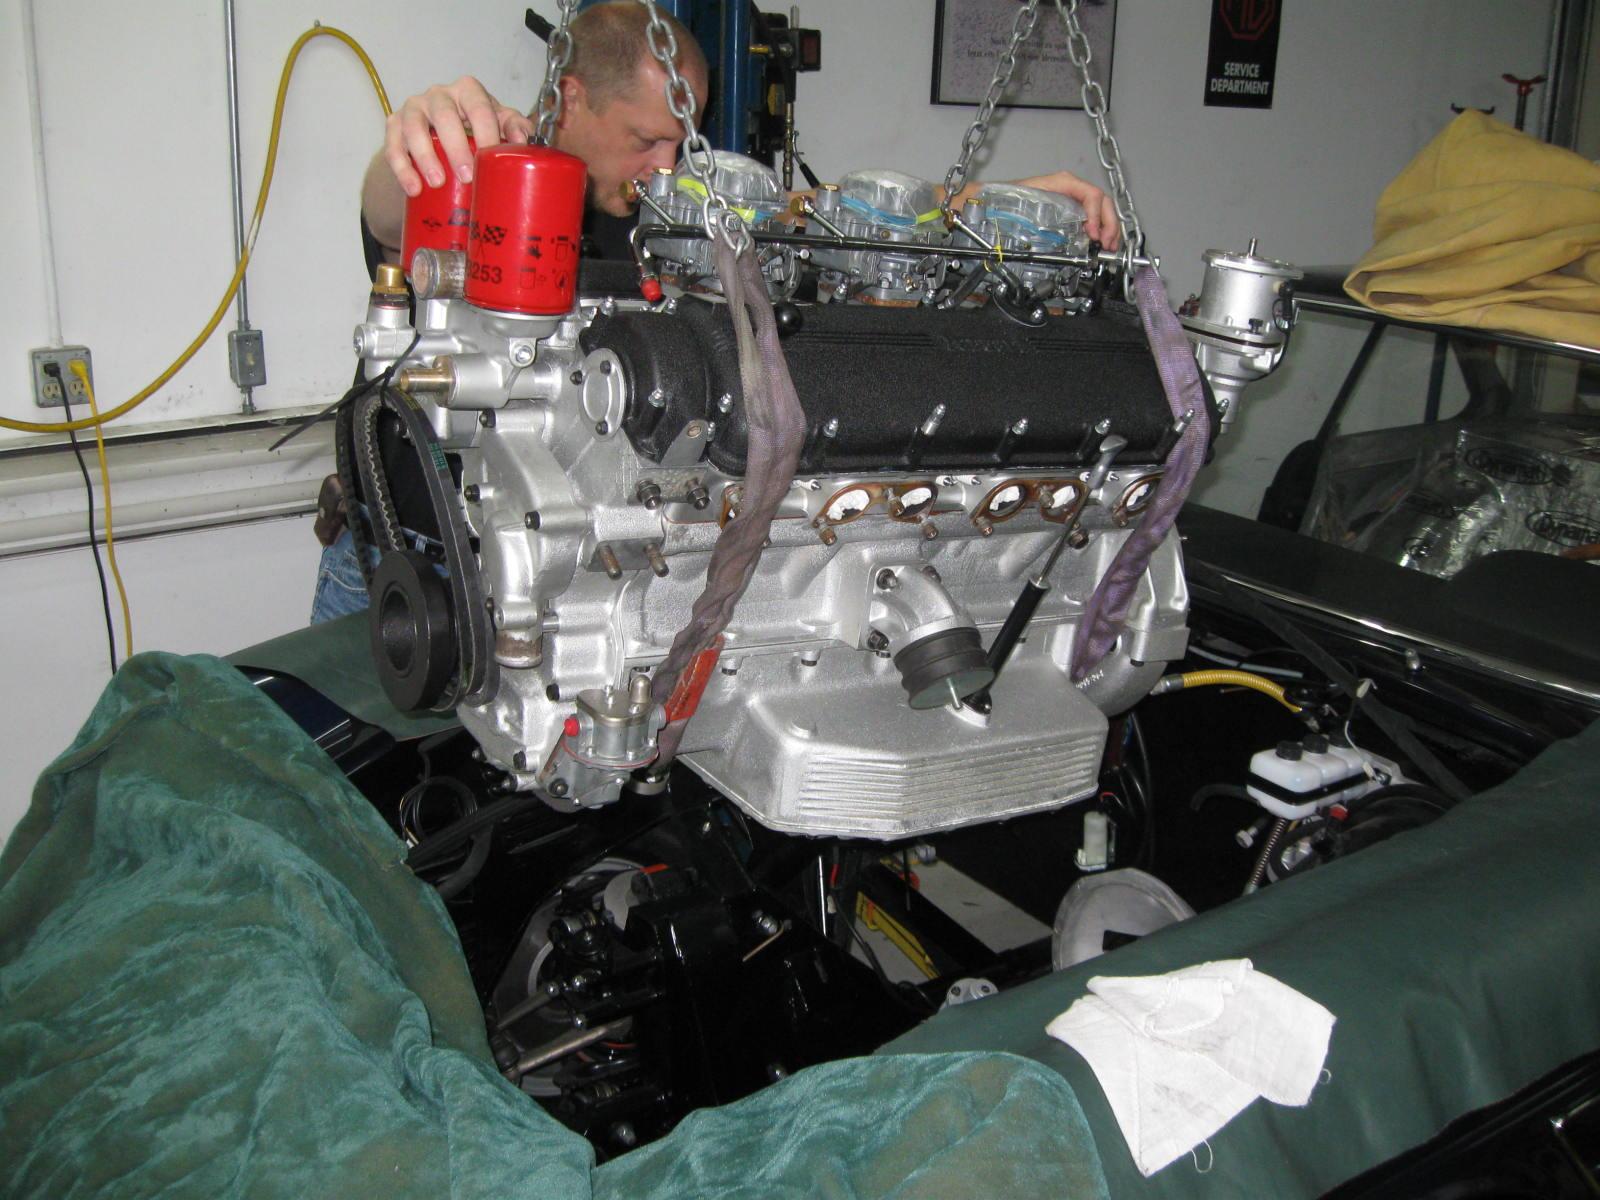 Ferrari 330 GTC engine